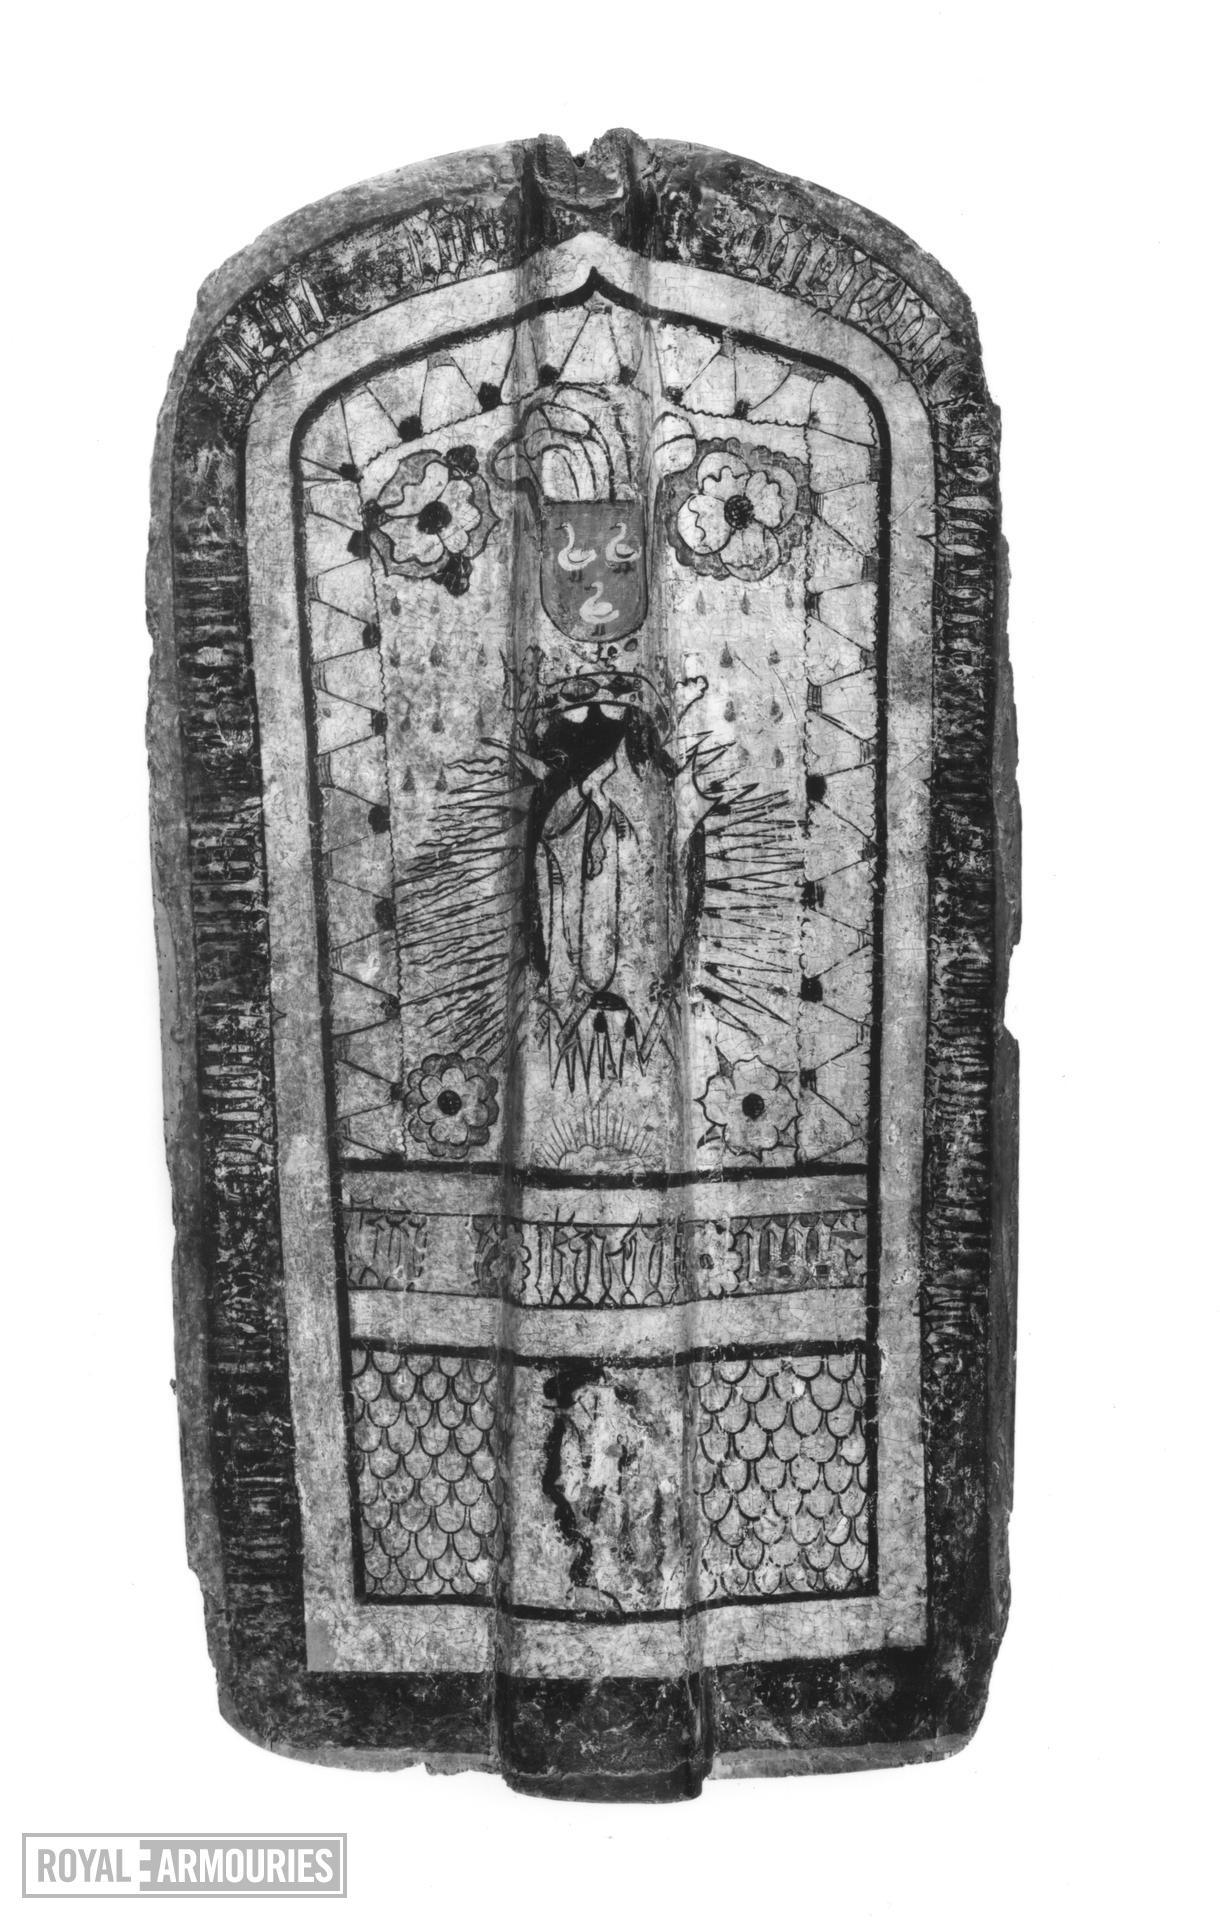 Pavise bearing the arms of Zwickau